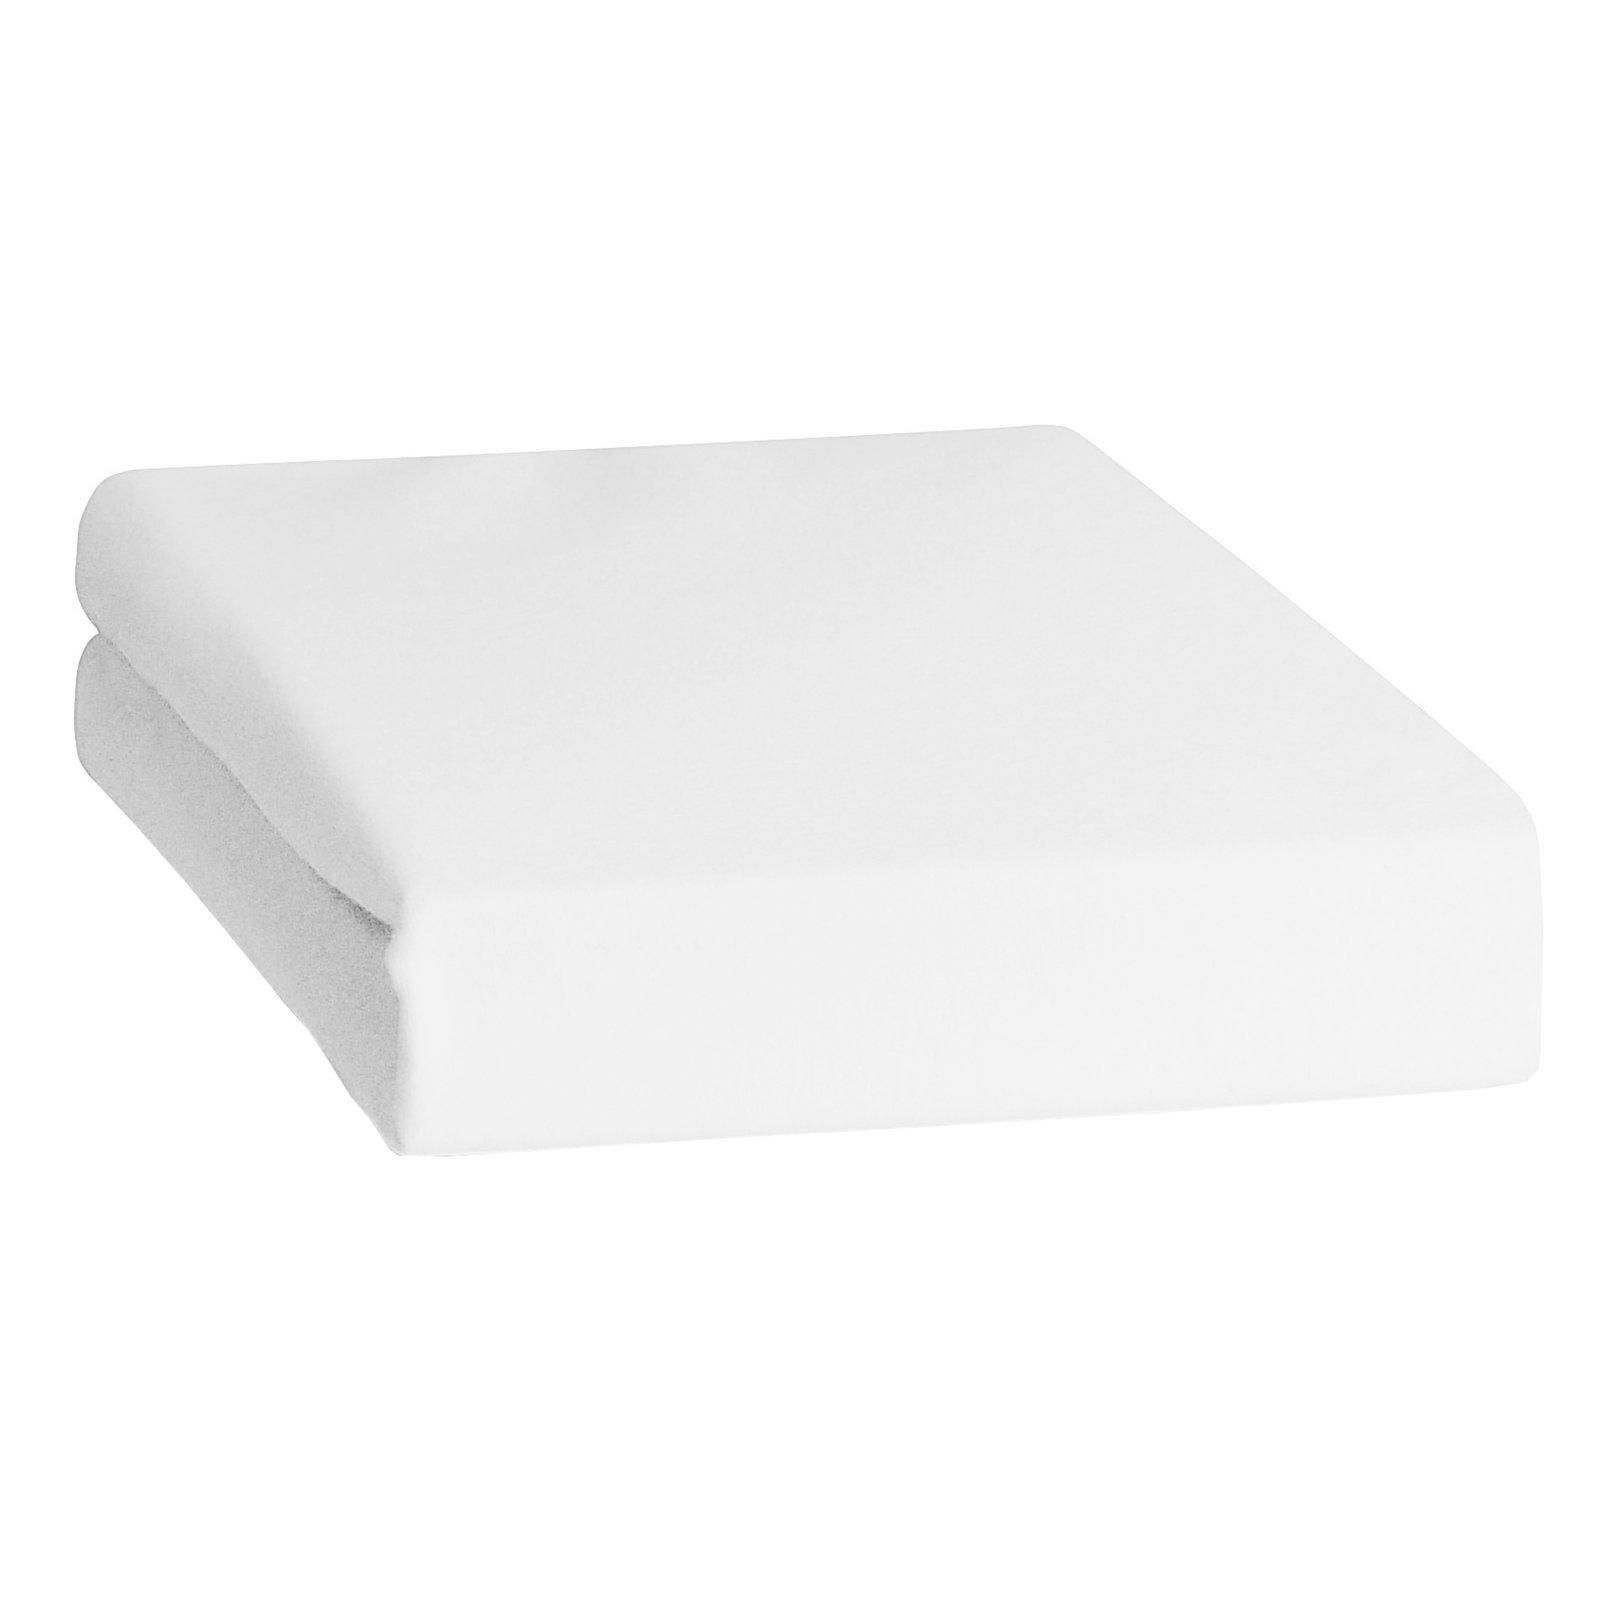 feinbiber spannbettlaken wei 100x200 cm bettlaken bettw sche bettlaken. Black Bedroom Furniture Sets. Home Design Ideas